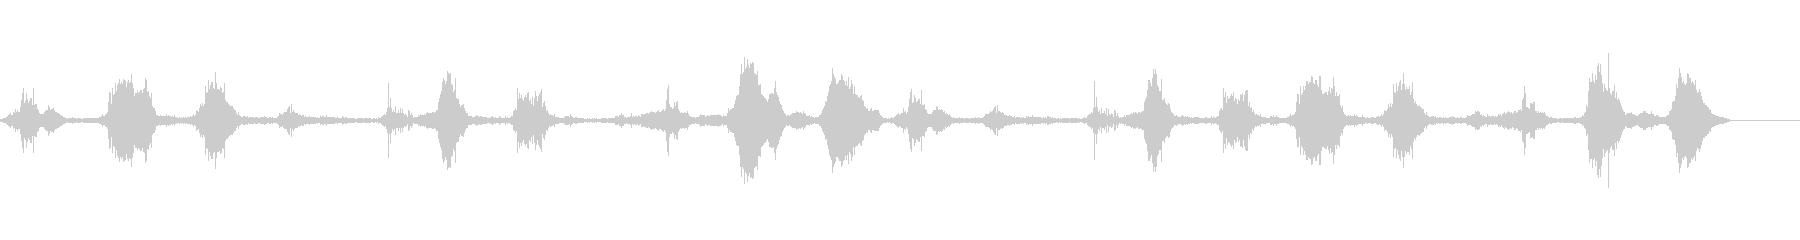 OLAS-小型ローラー-アリーナ-近くの未再生の波形